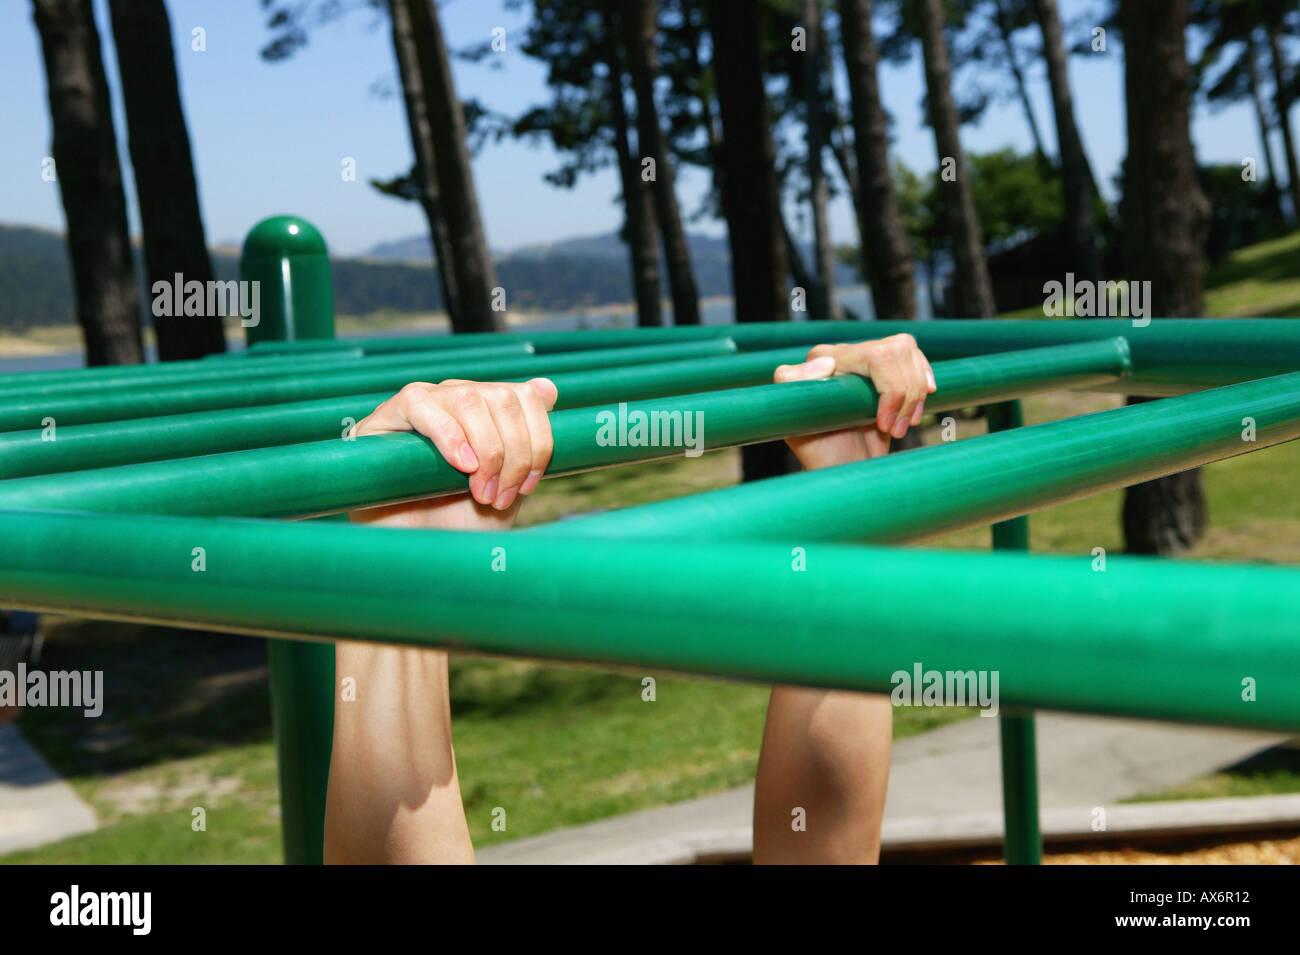 Person hanging onto monkey bars - Stock Image